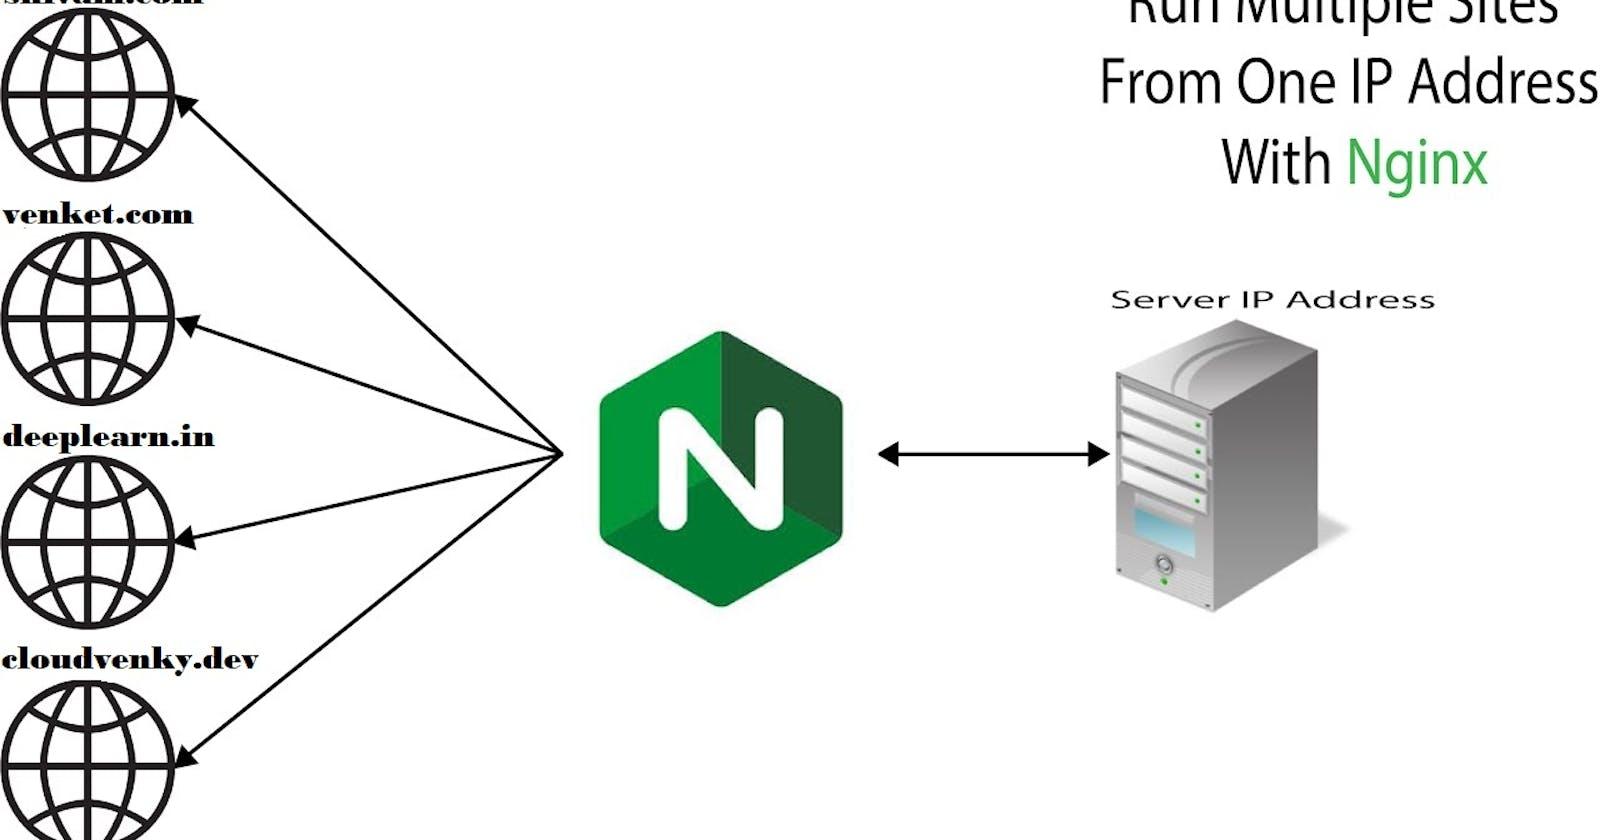 How to configure Multisite in Nginx on Ubuntu 18